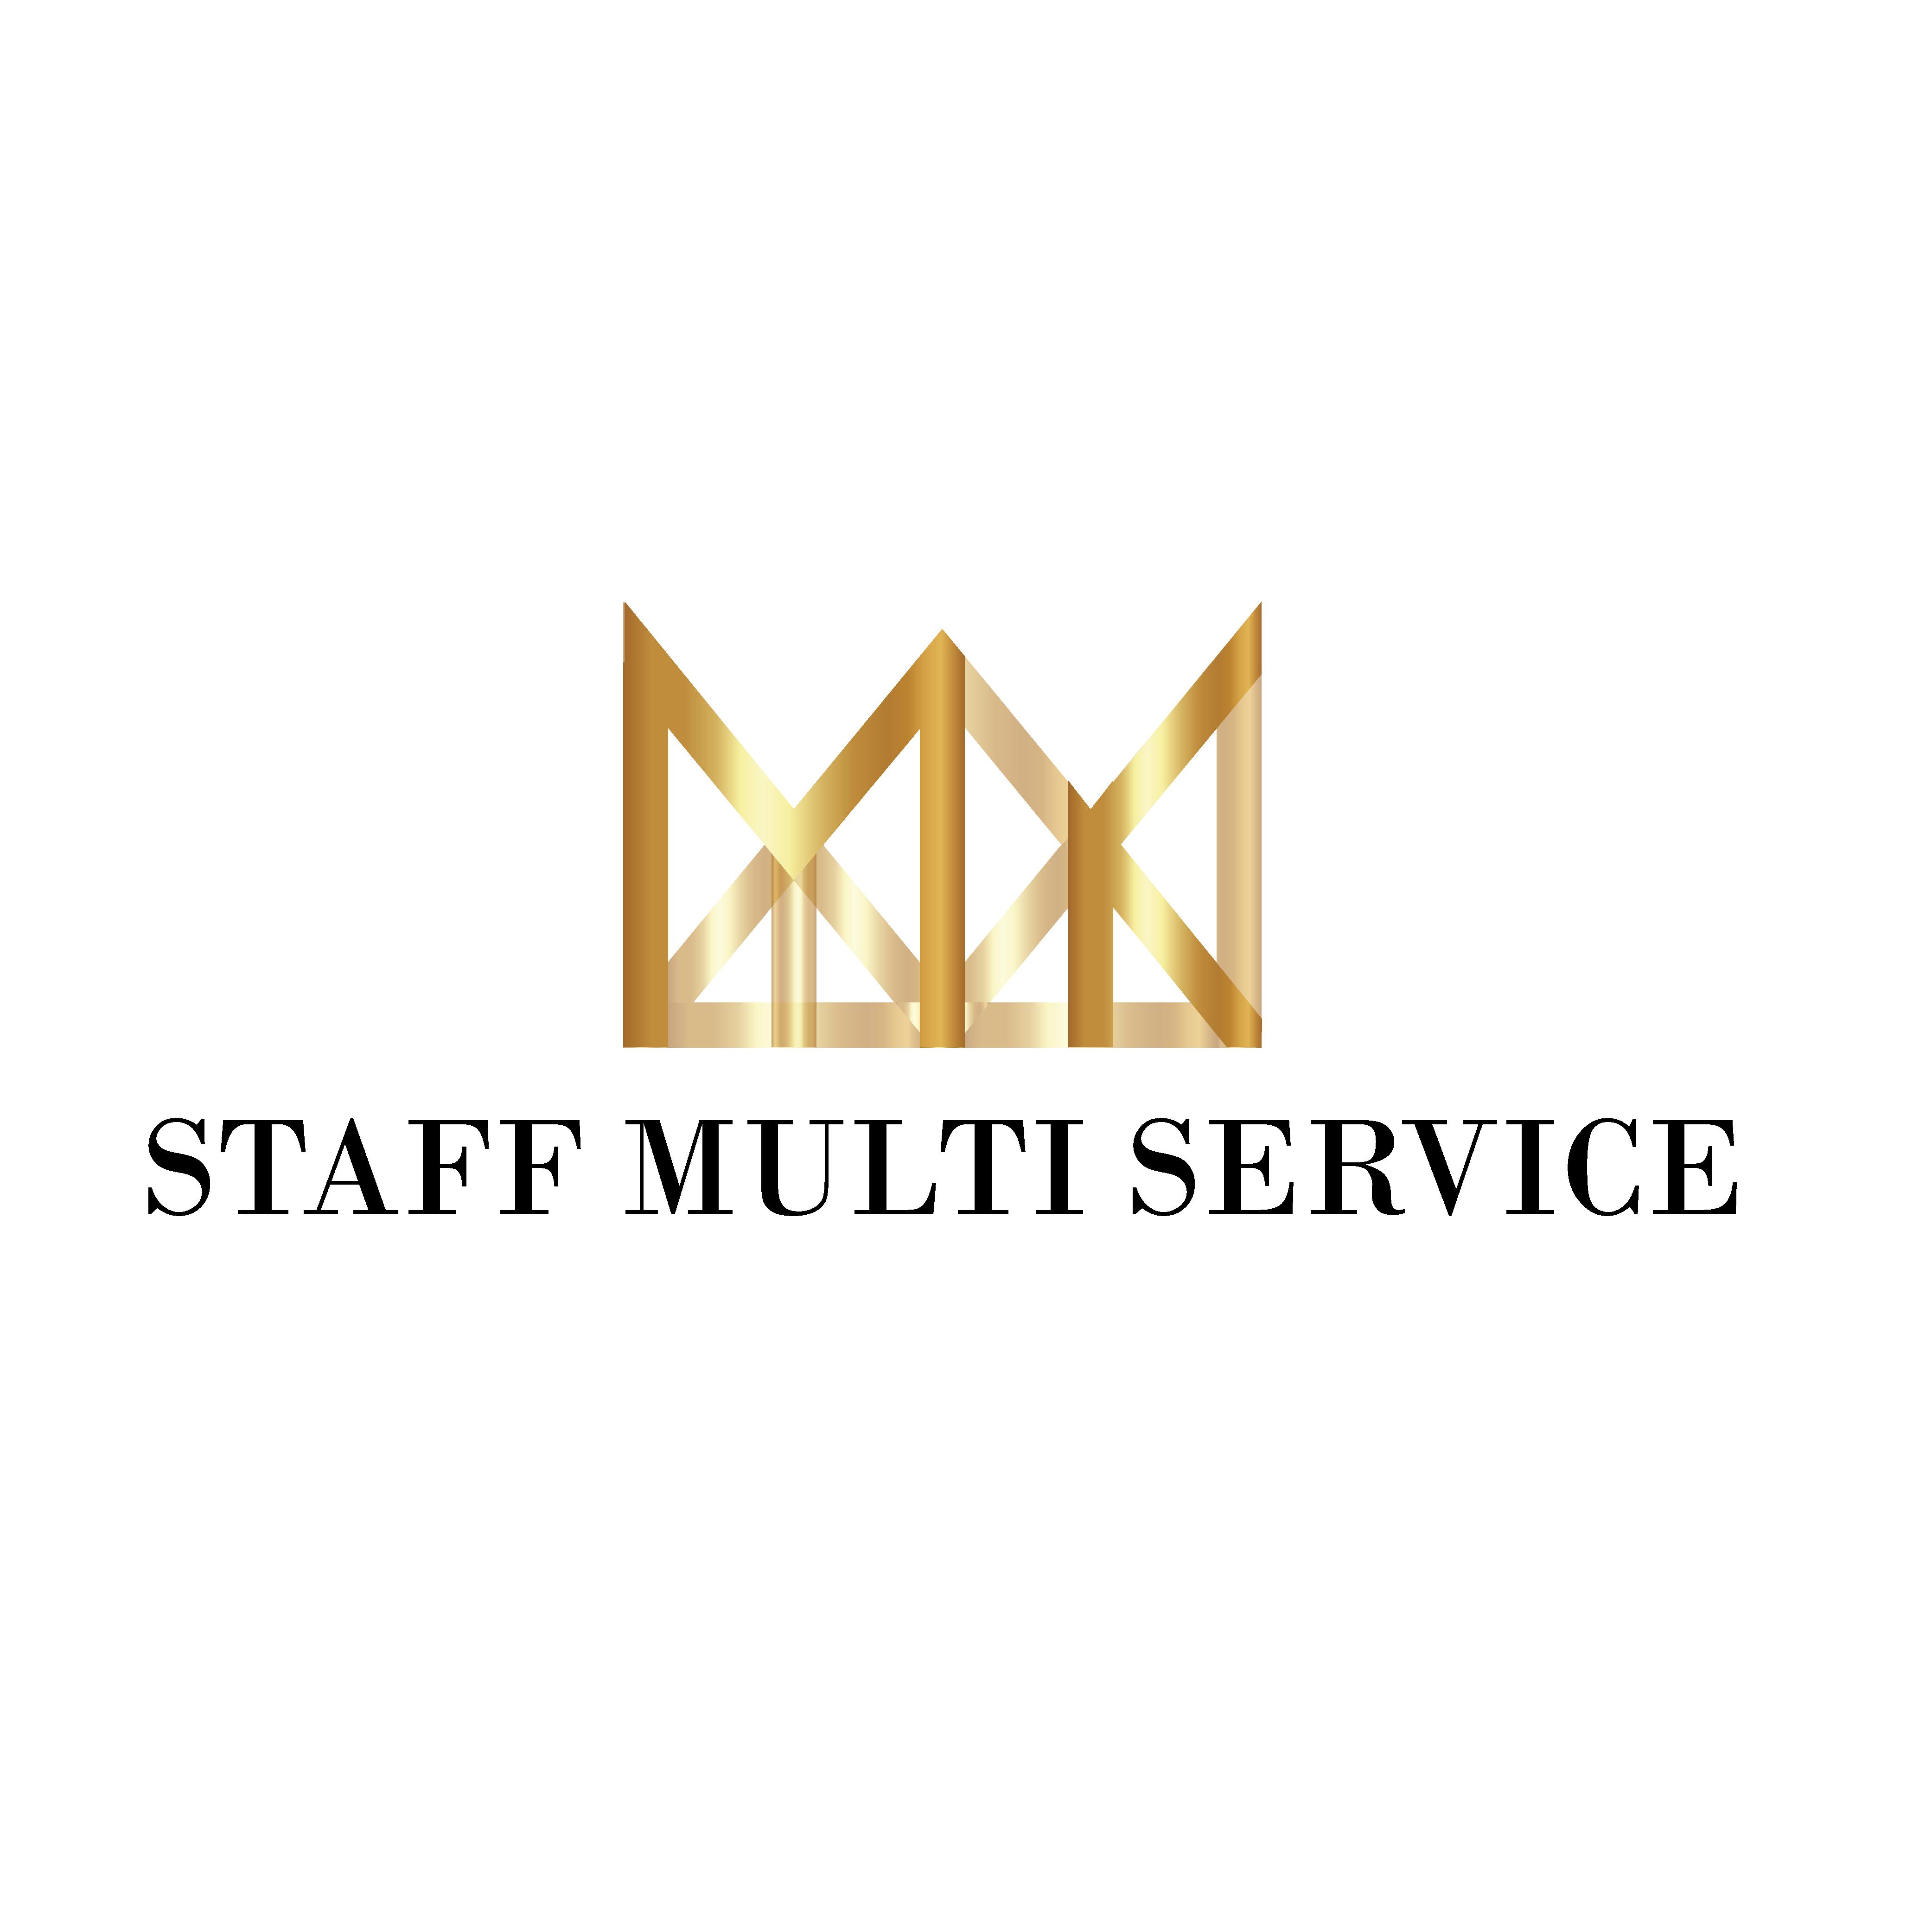 Staff Multi Service